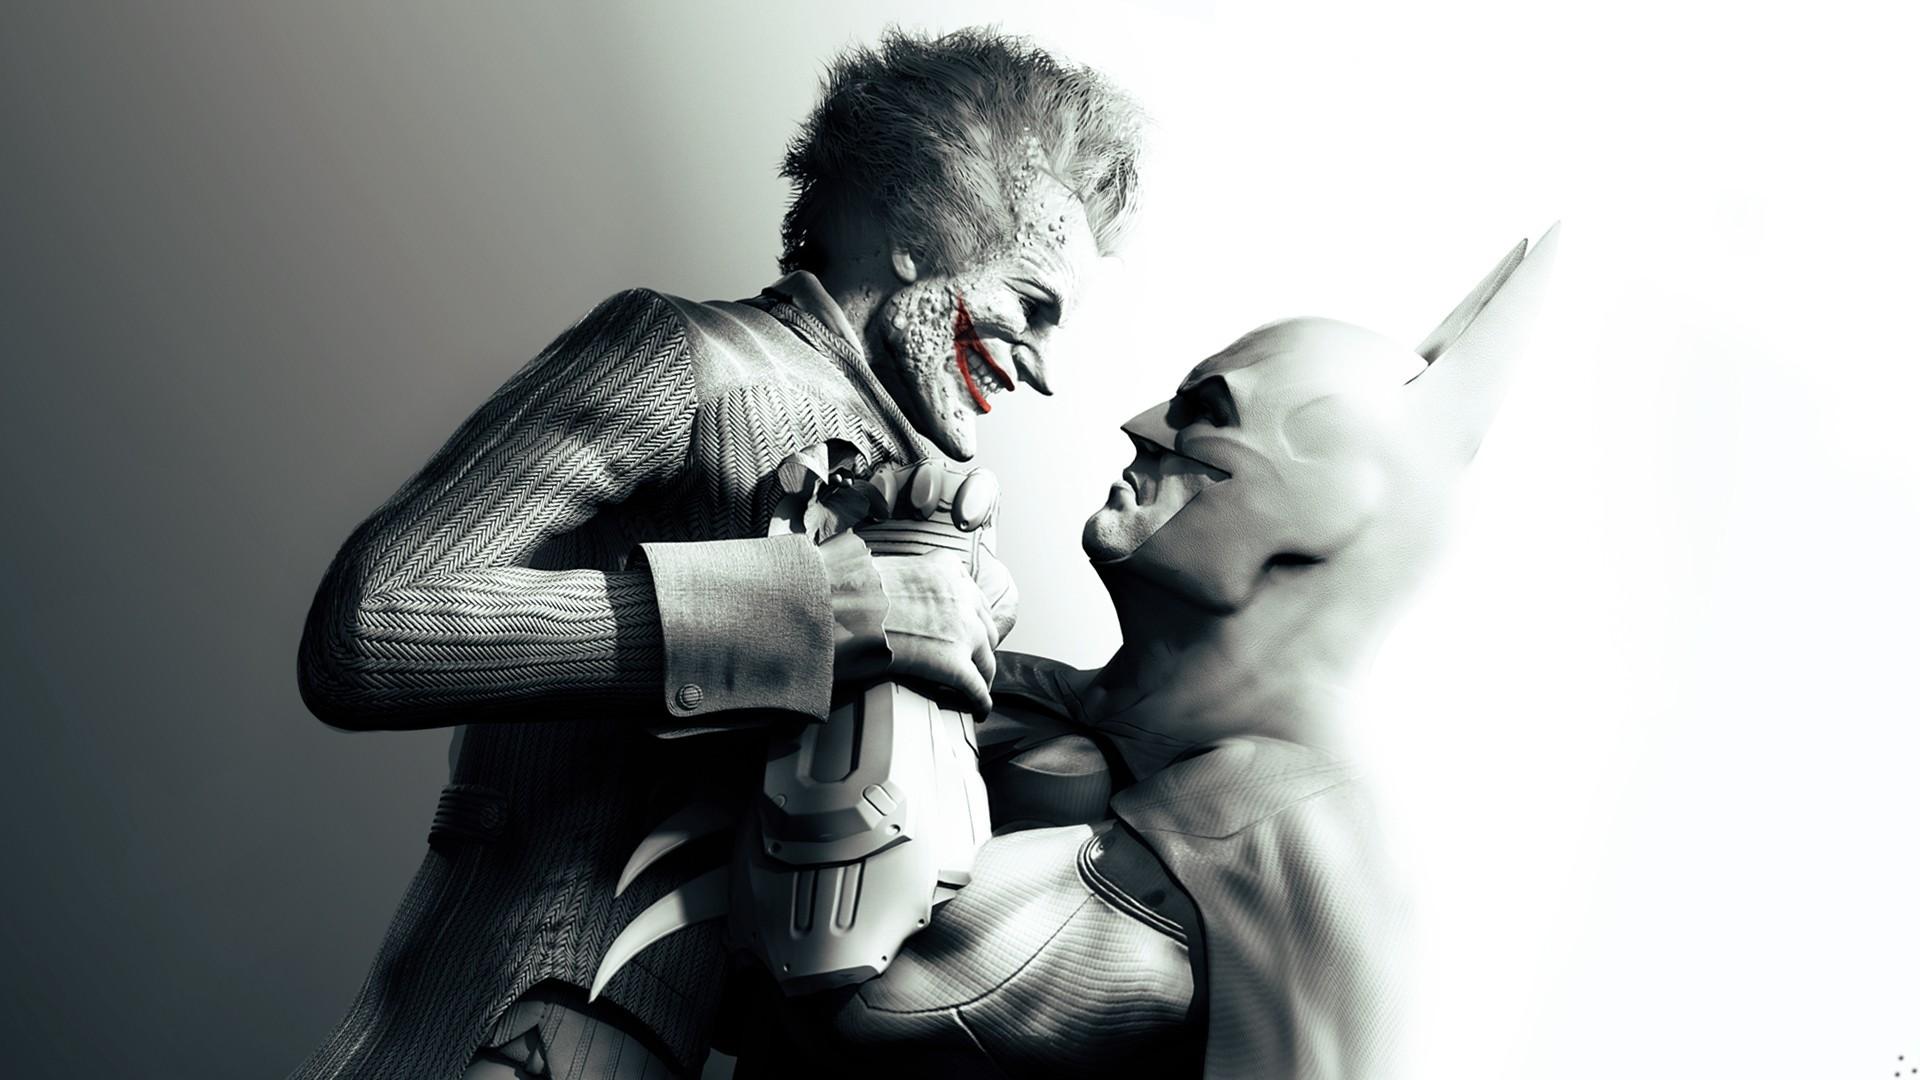 539 <b>Joker</b> HD <b>Wallpapers</